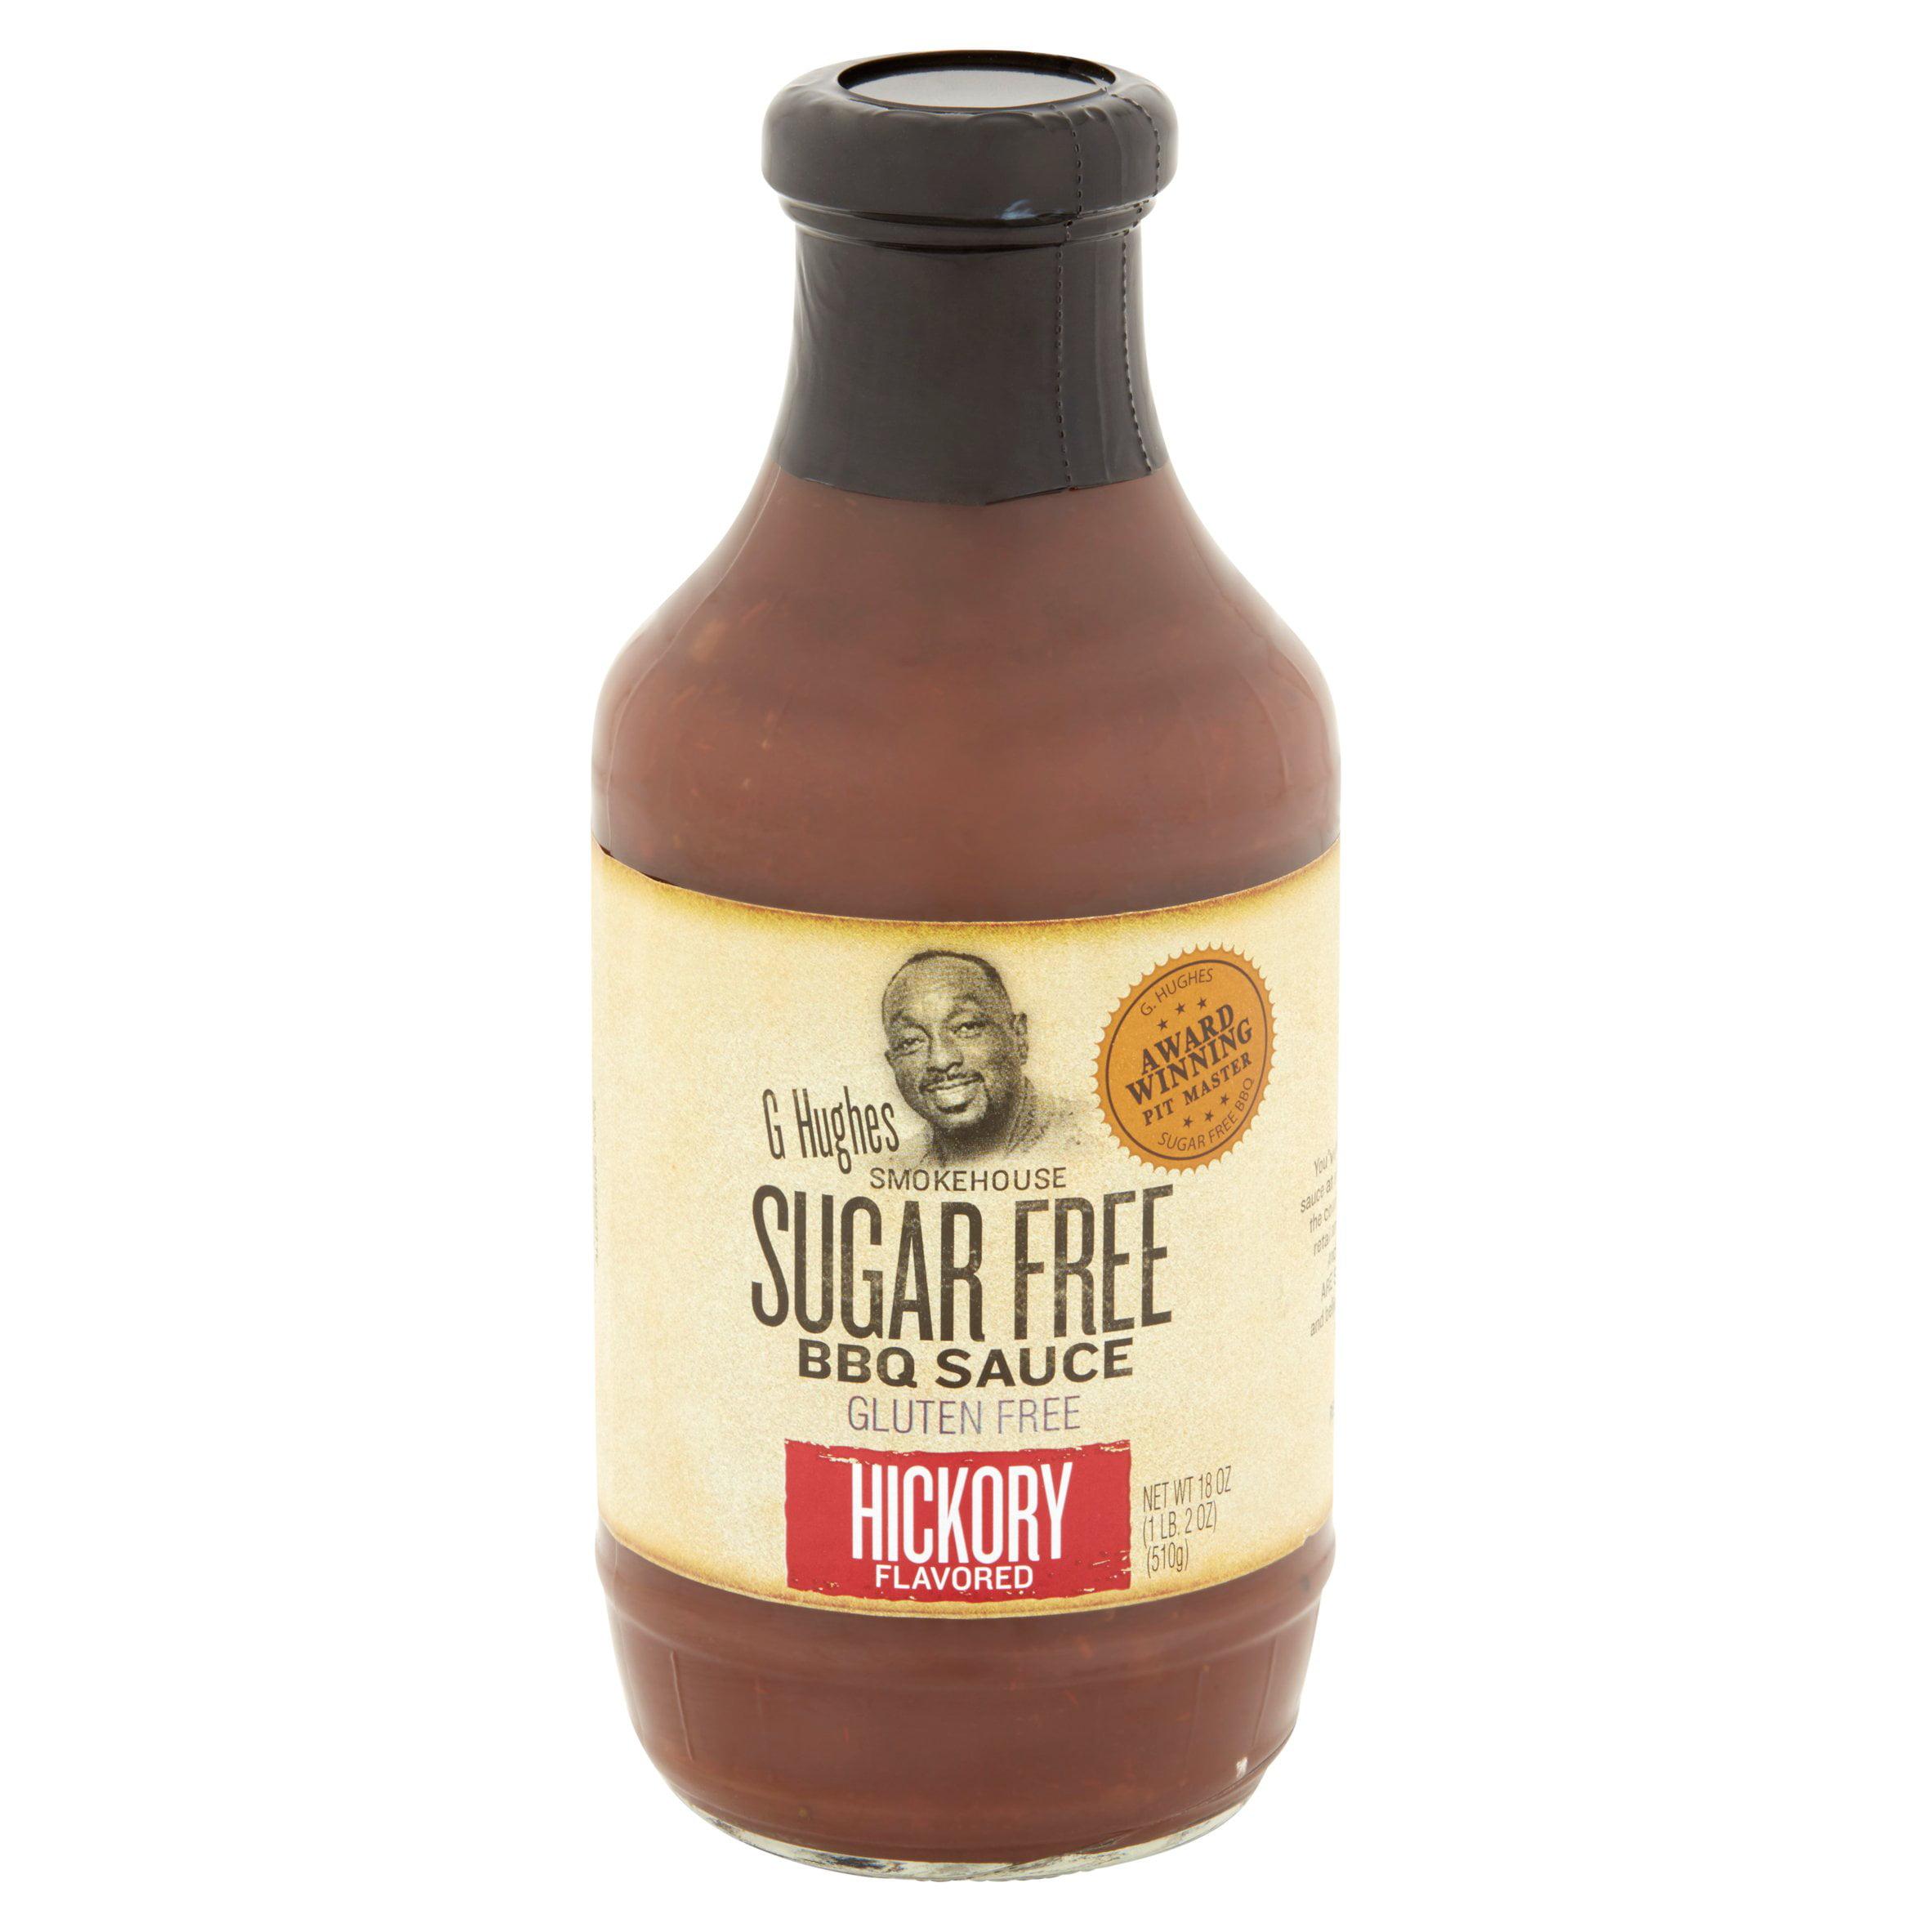 Barbecue Sauce For Sale Part - 34: G Hughes Smokehouse Sugar Free Hickory Flavored BBQ Sauce, 18 Oz -  Walmart.com